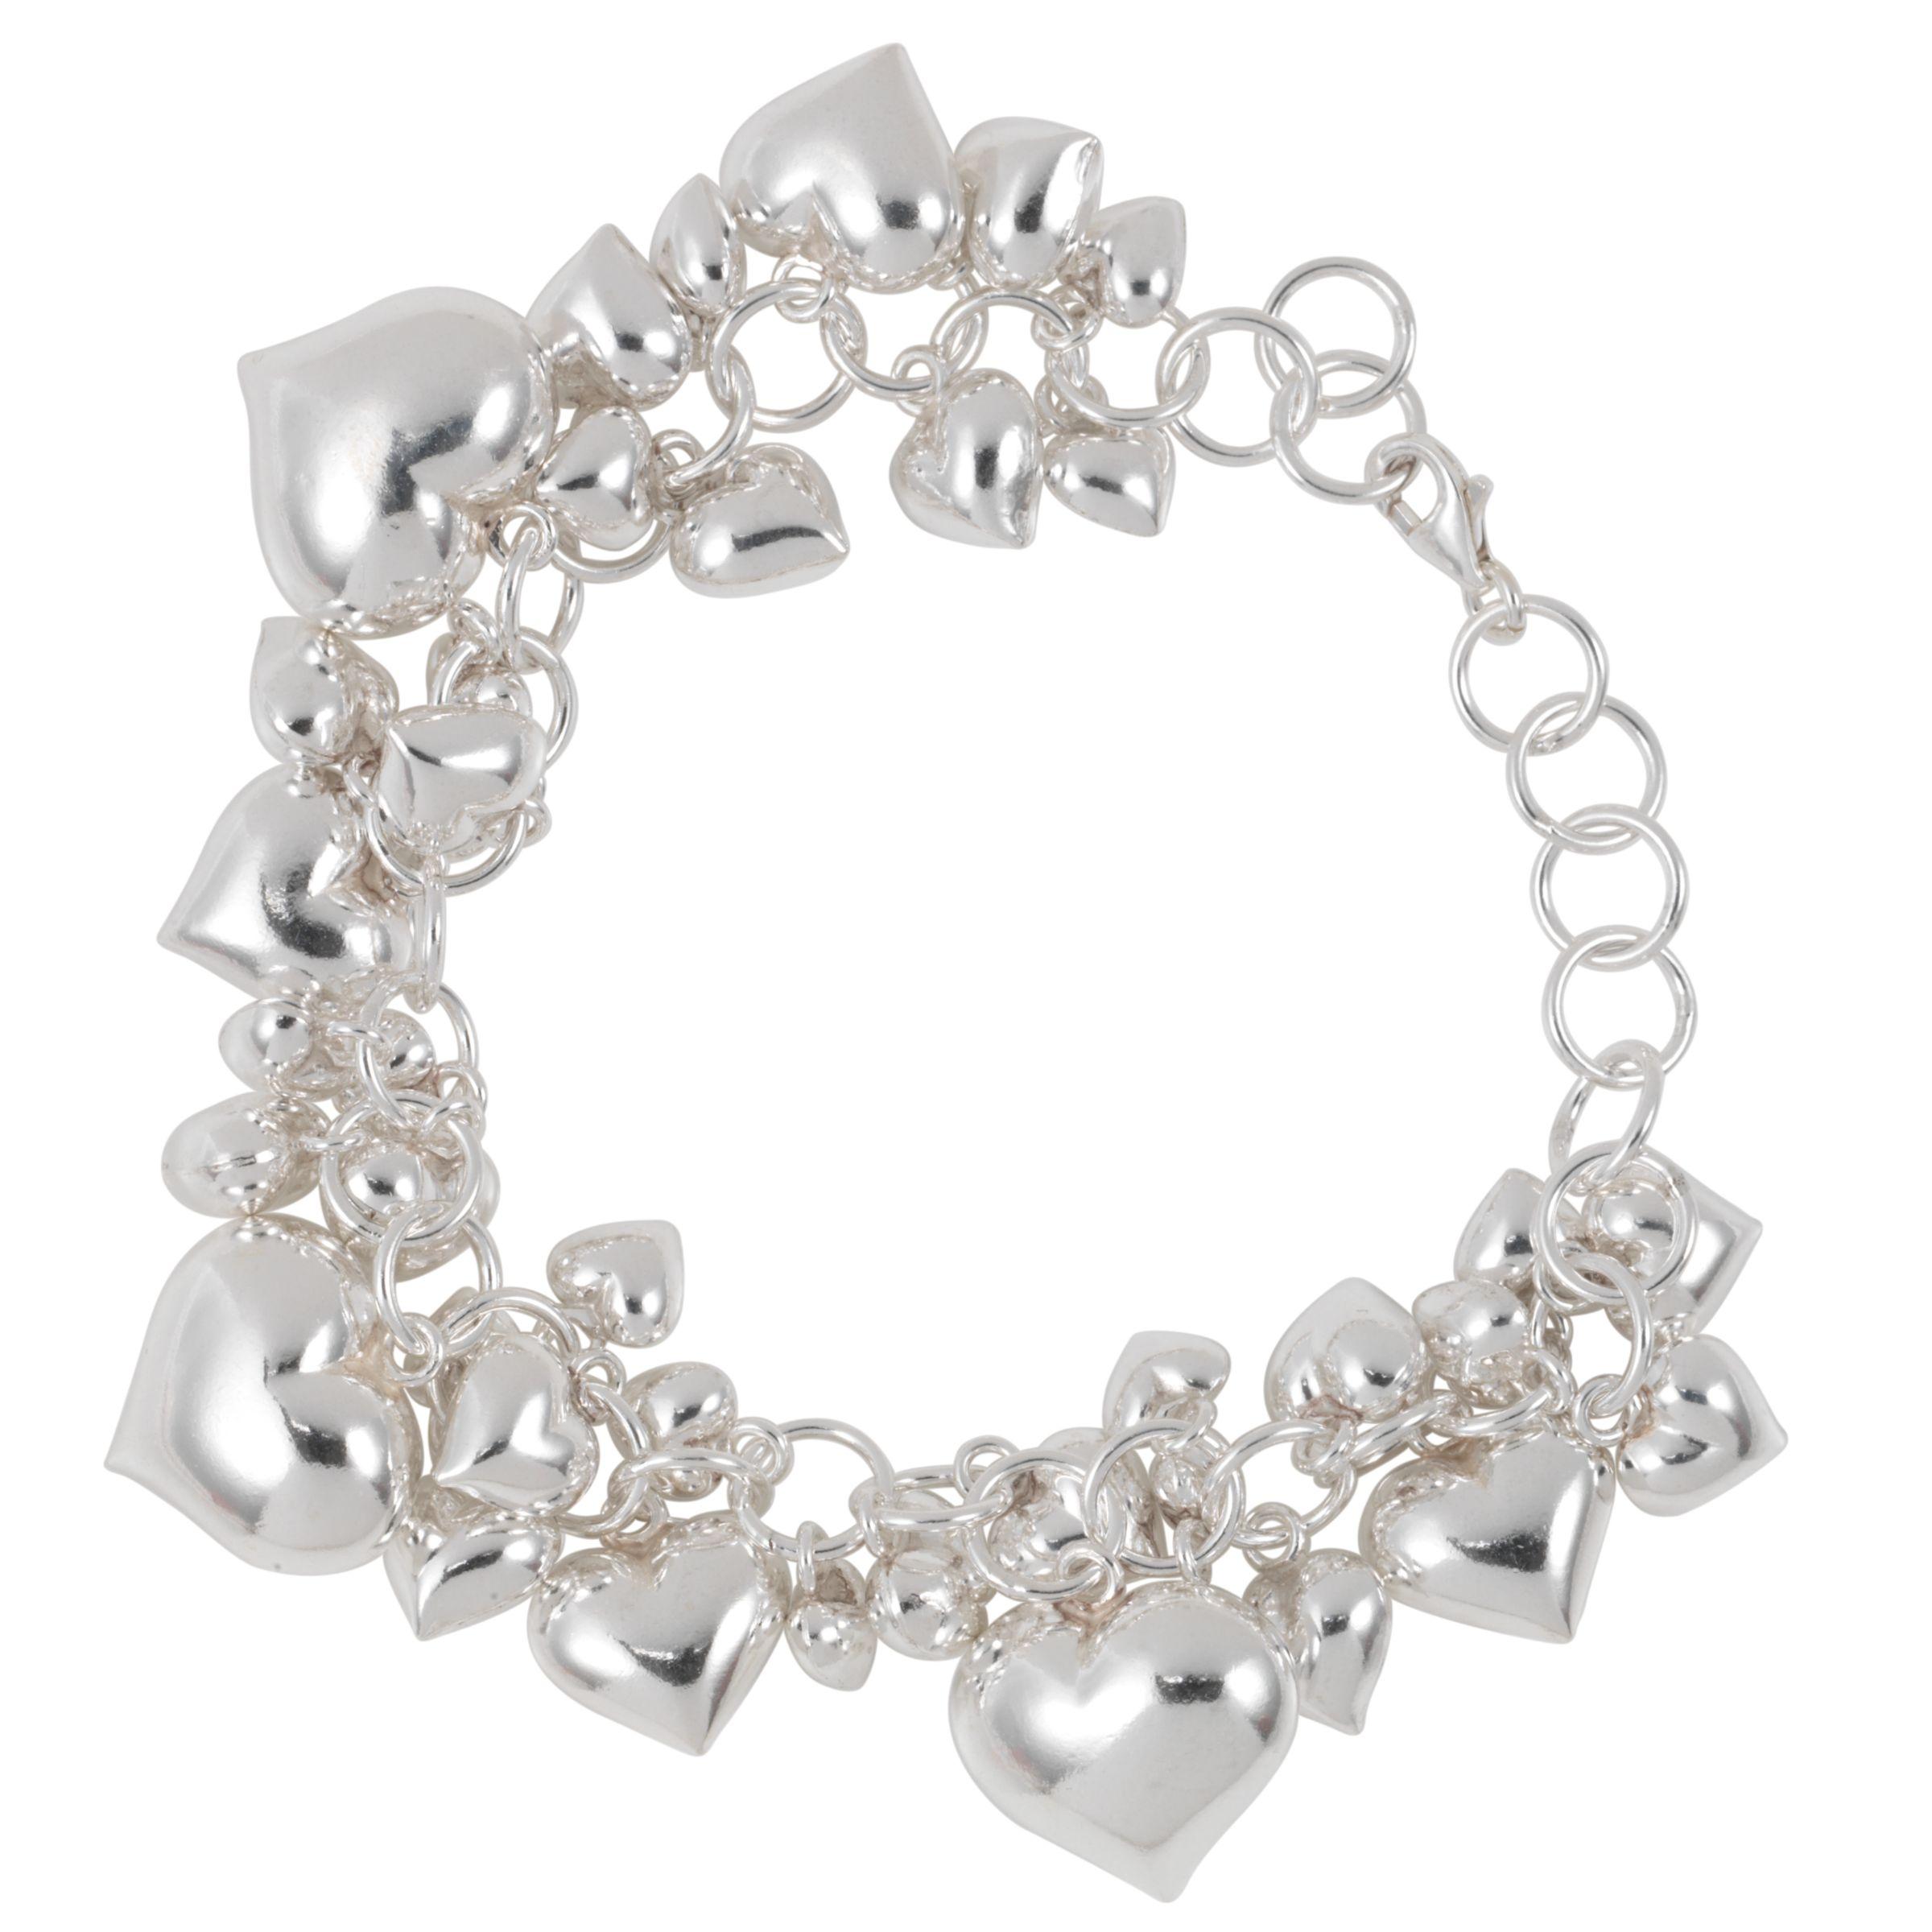 Martick Silver Heart Charm Bracelet Bluewater